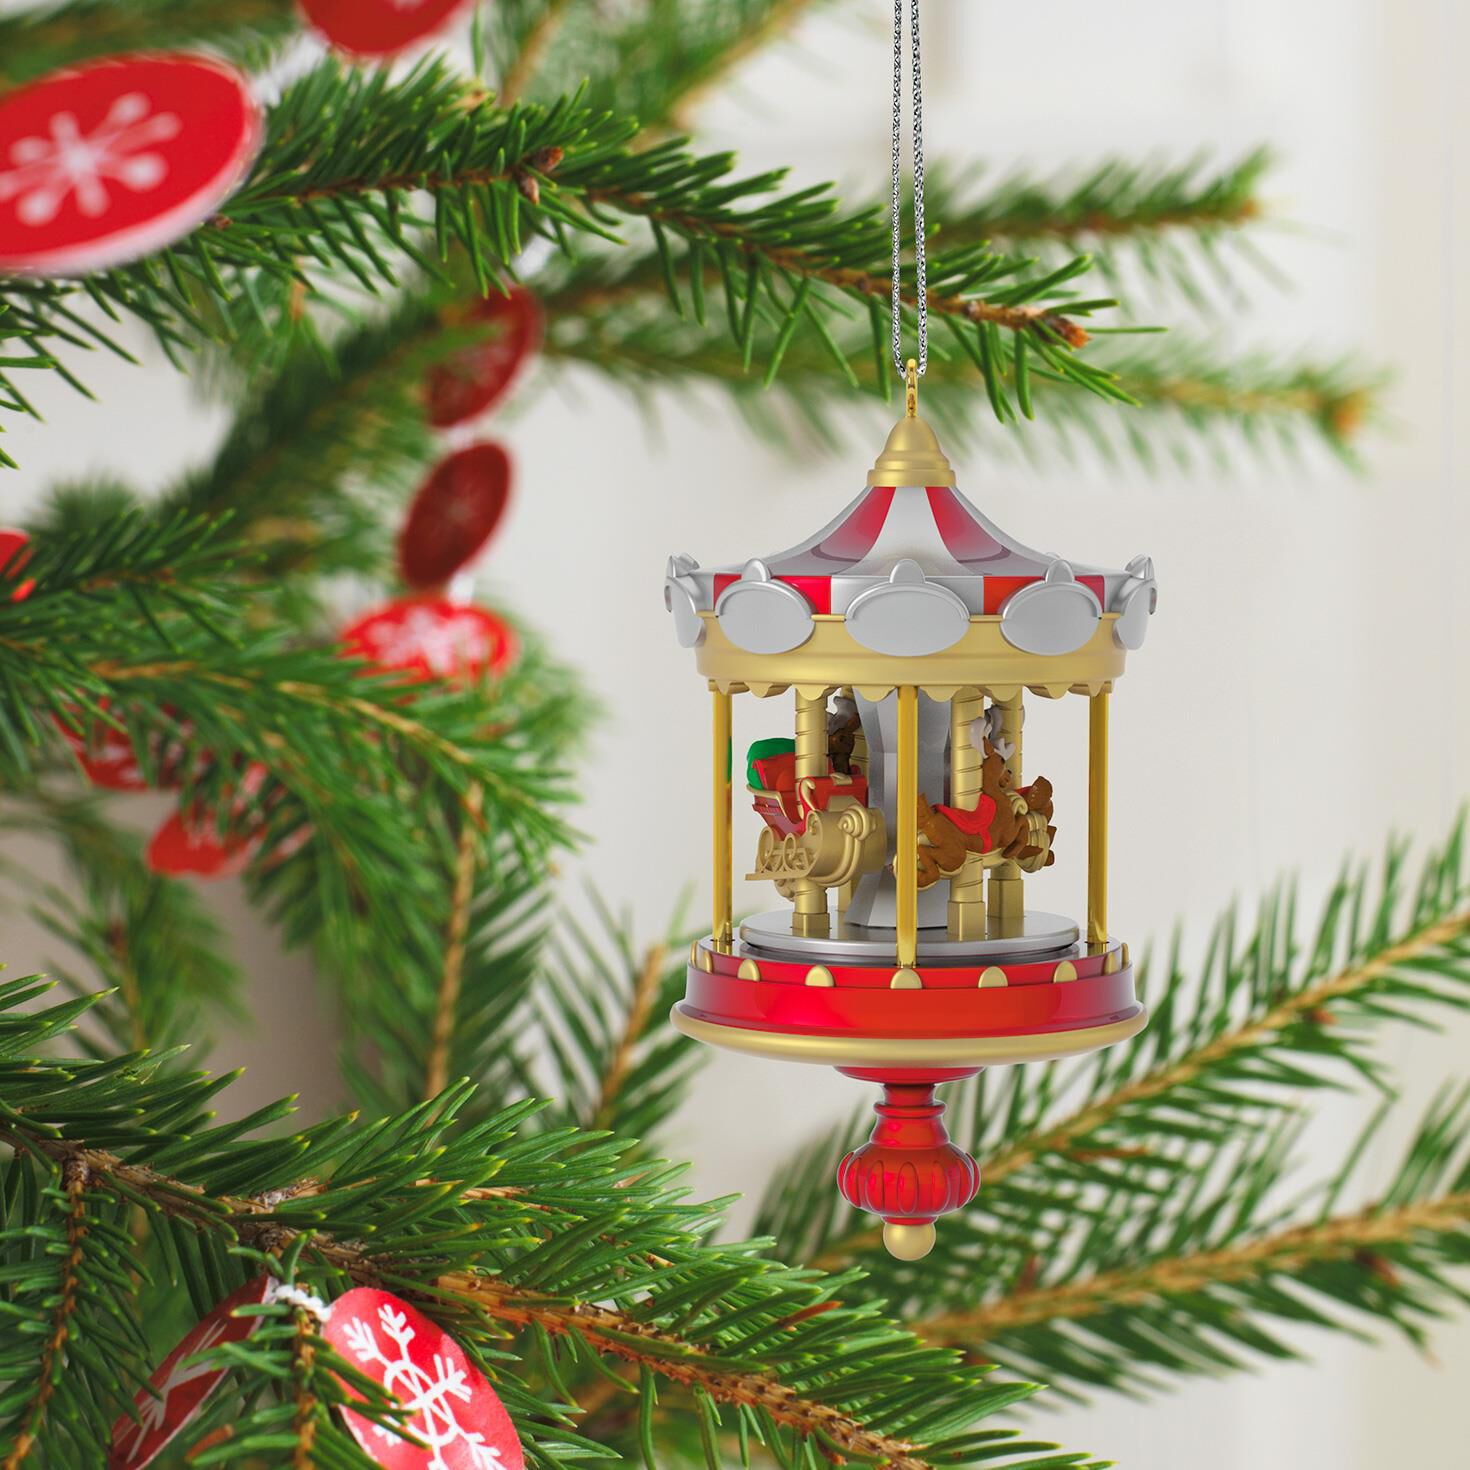 Colorado Christmas Ornaments Part - 46: Christmas Carousel Mini Ornament Christmas Carousel Mini Ornament ...